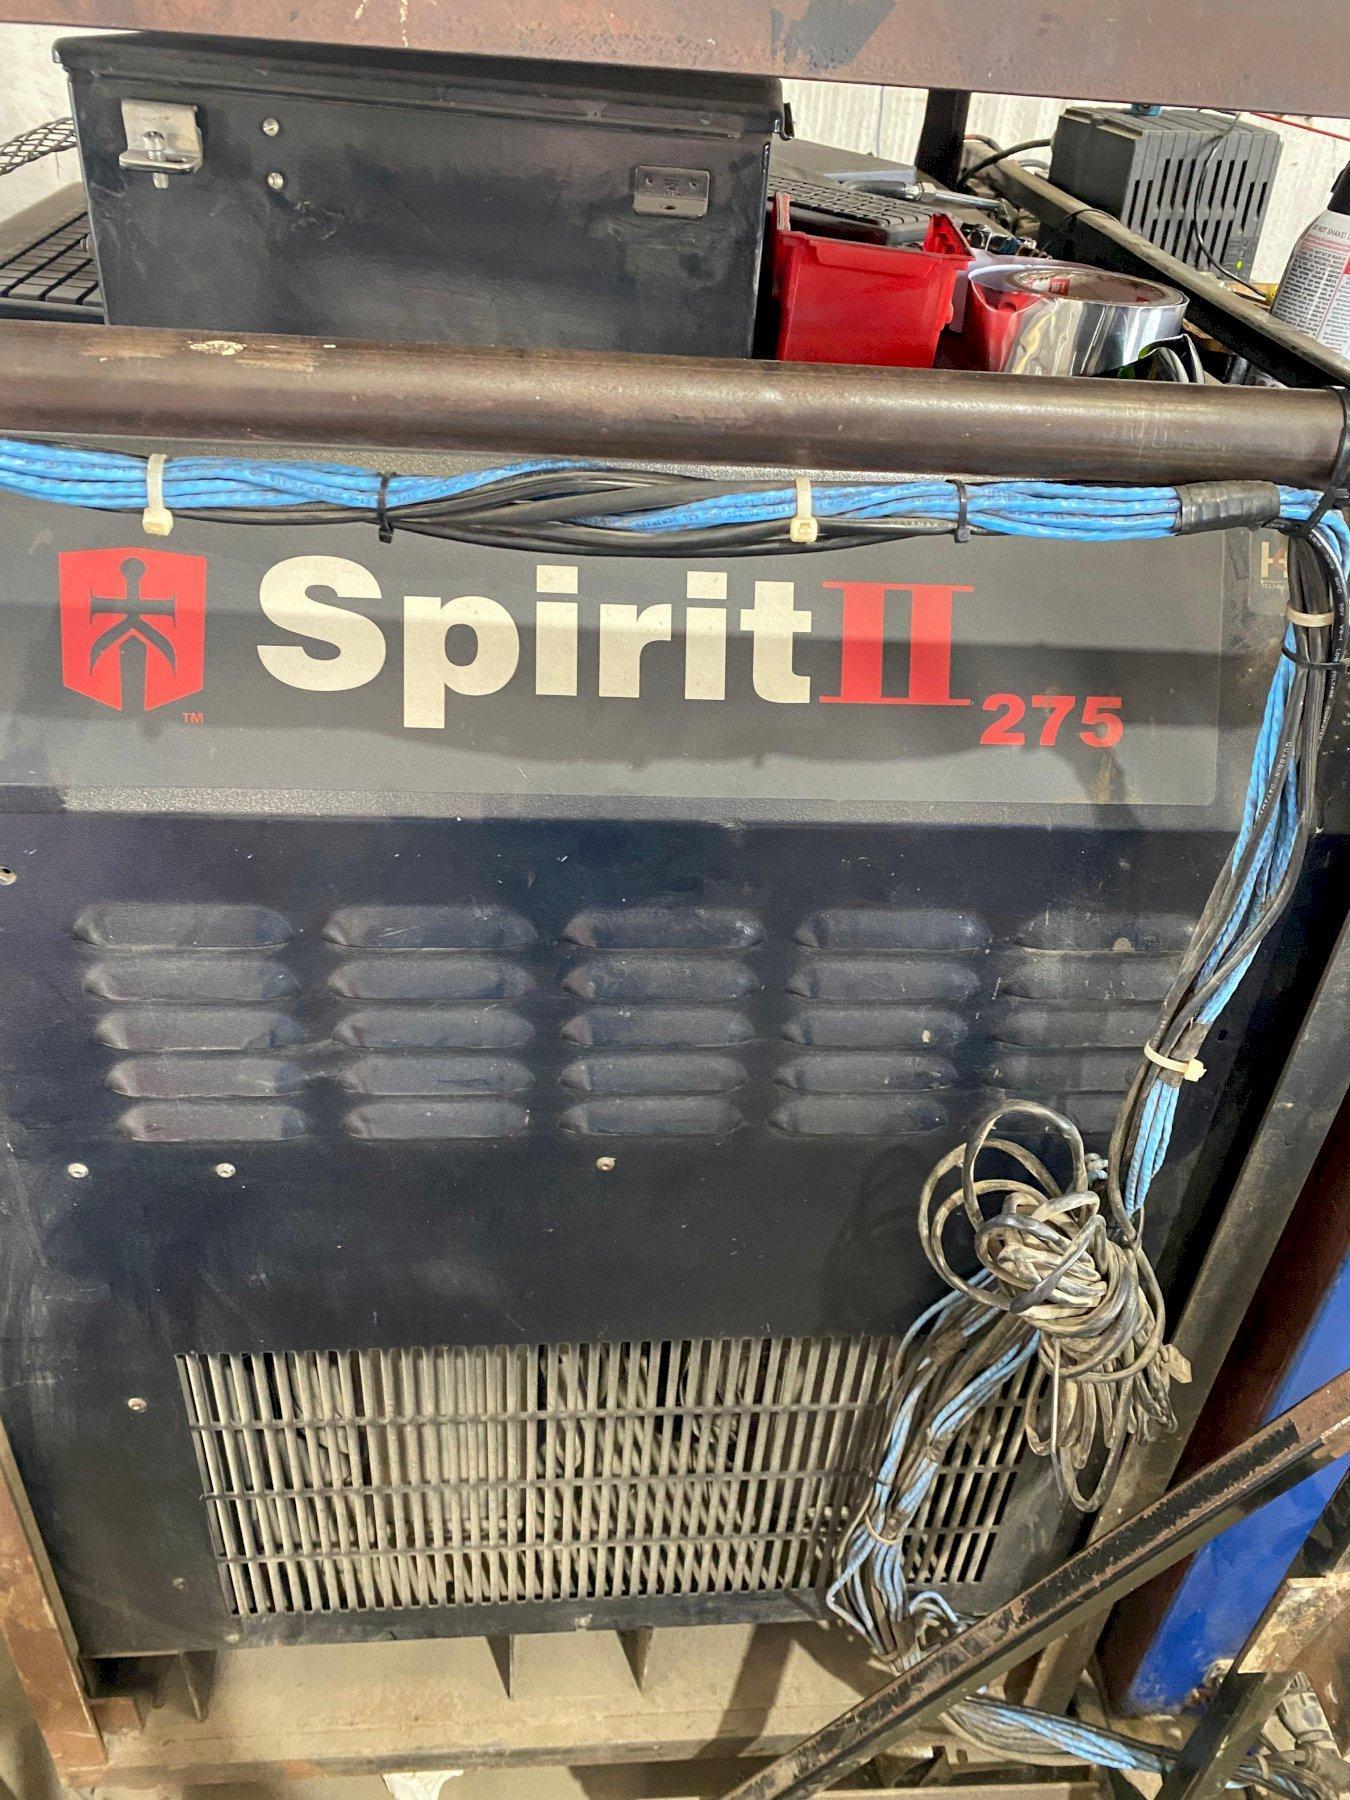 10' x 30' Burny Kaliburn Spirit II CNC Plasma Cutter